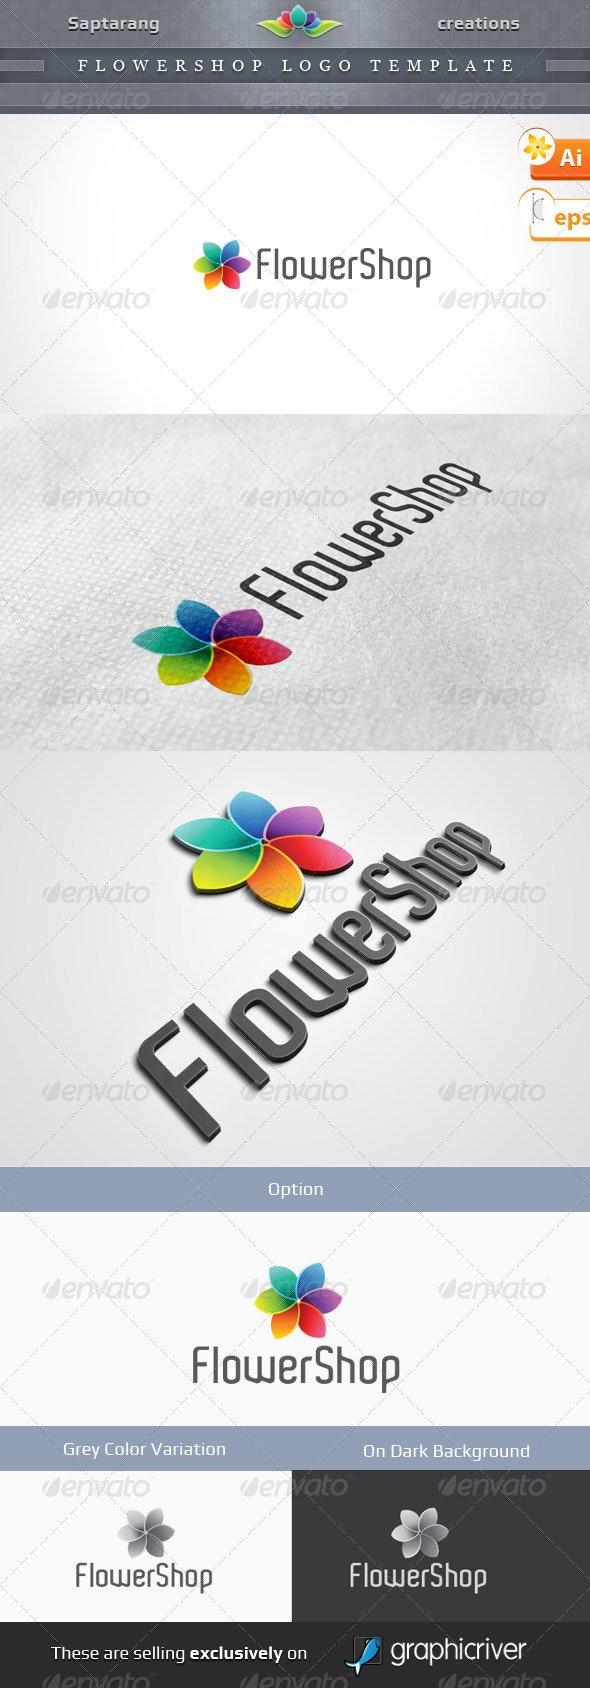 Flowershop Logo Template - Vector Abstract